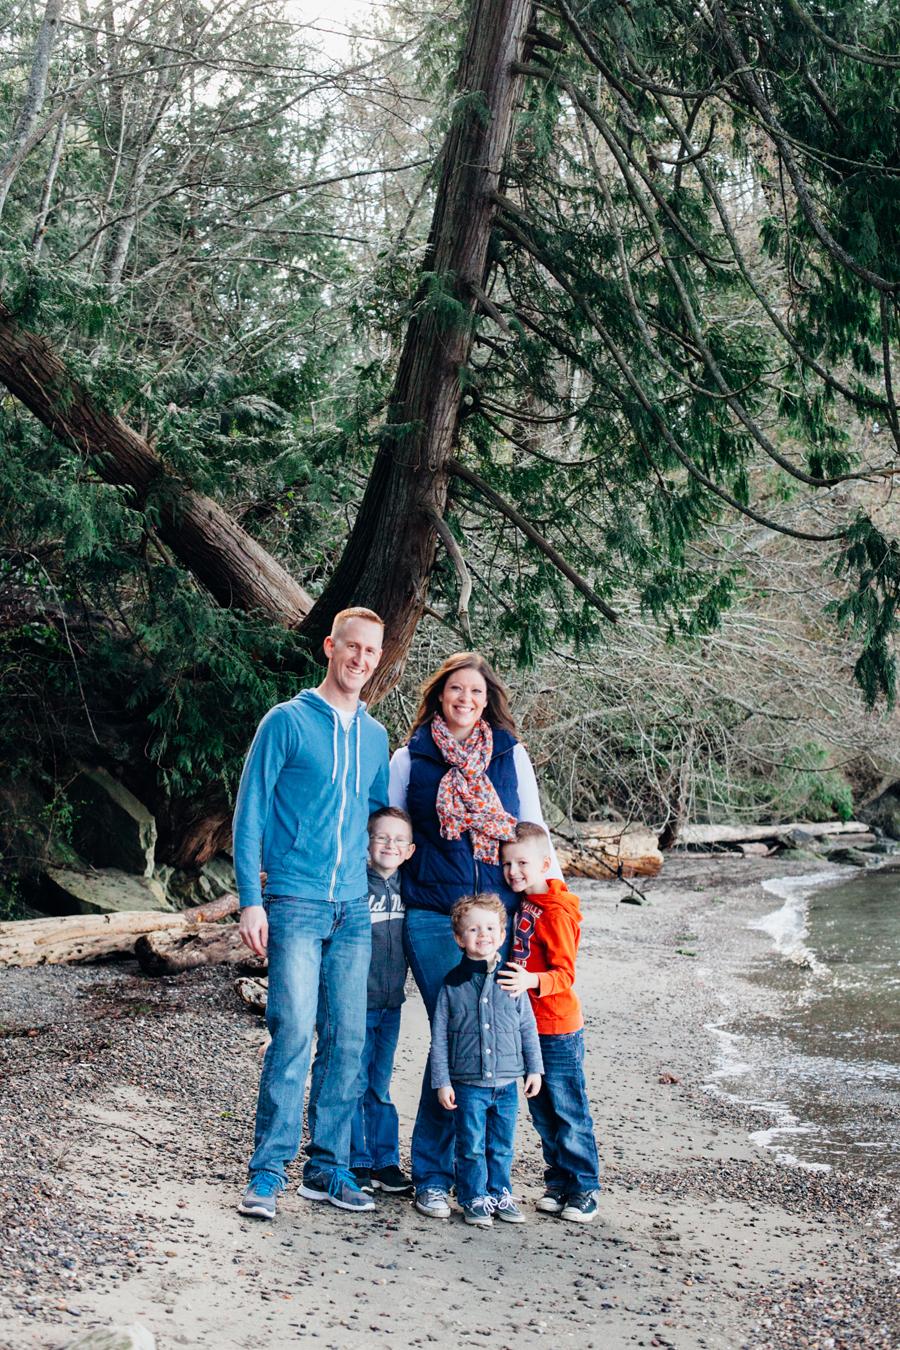 005-bellingham-family-photographer-ambritt-family-larrabee-state-park-katheryn-moran-photography.jpg